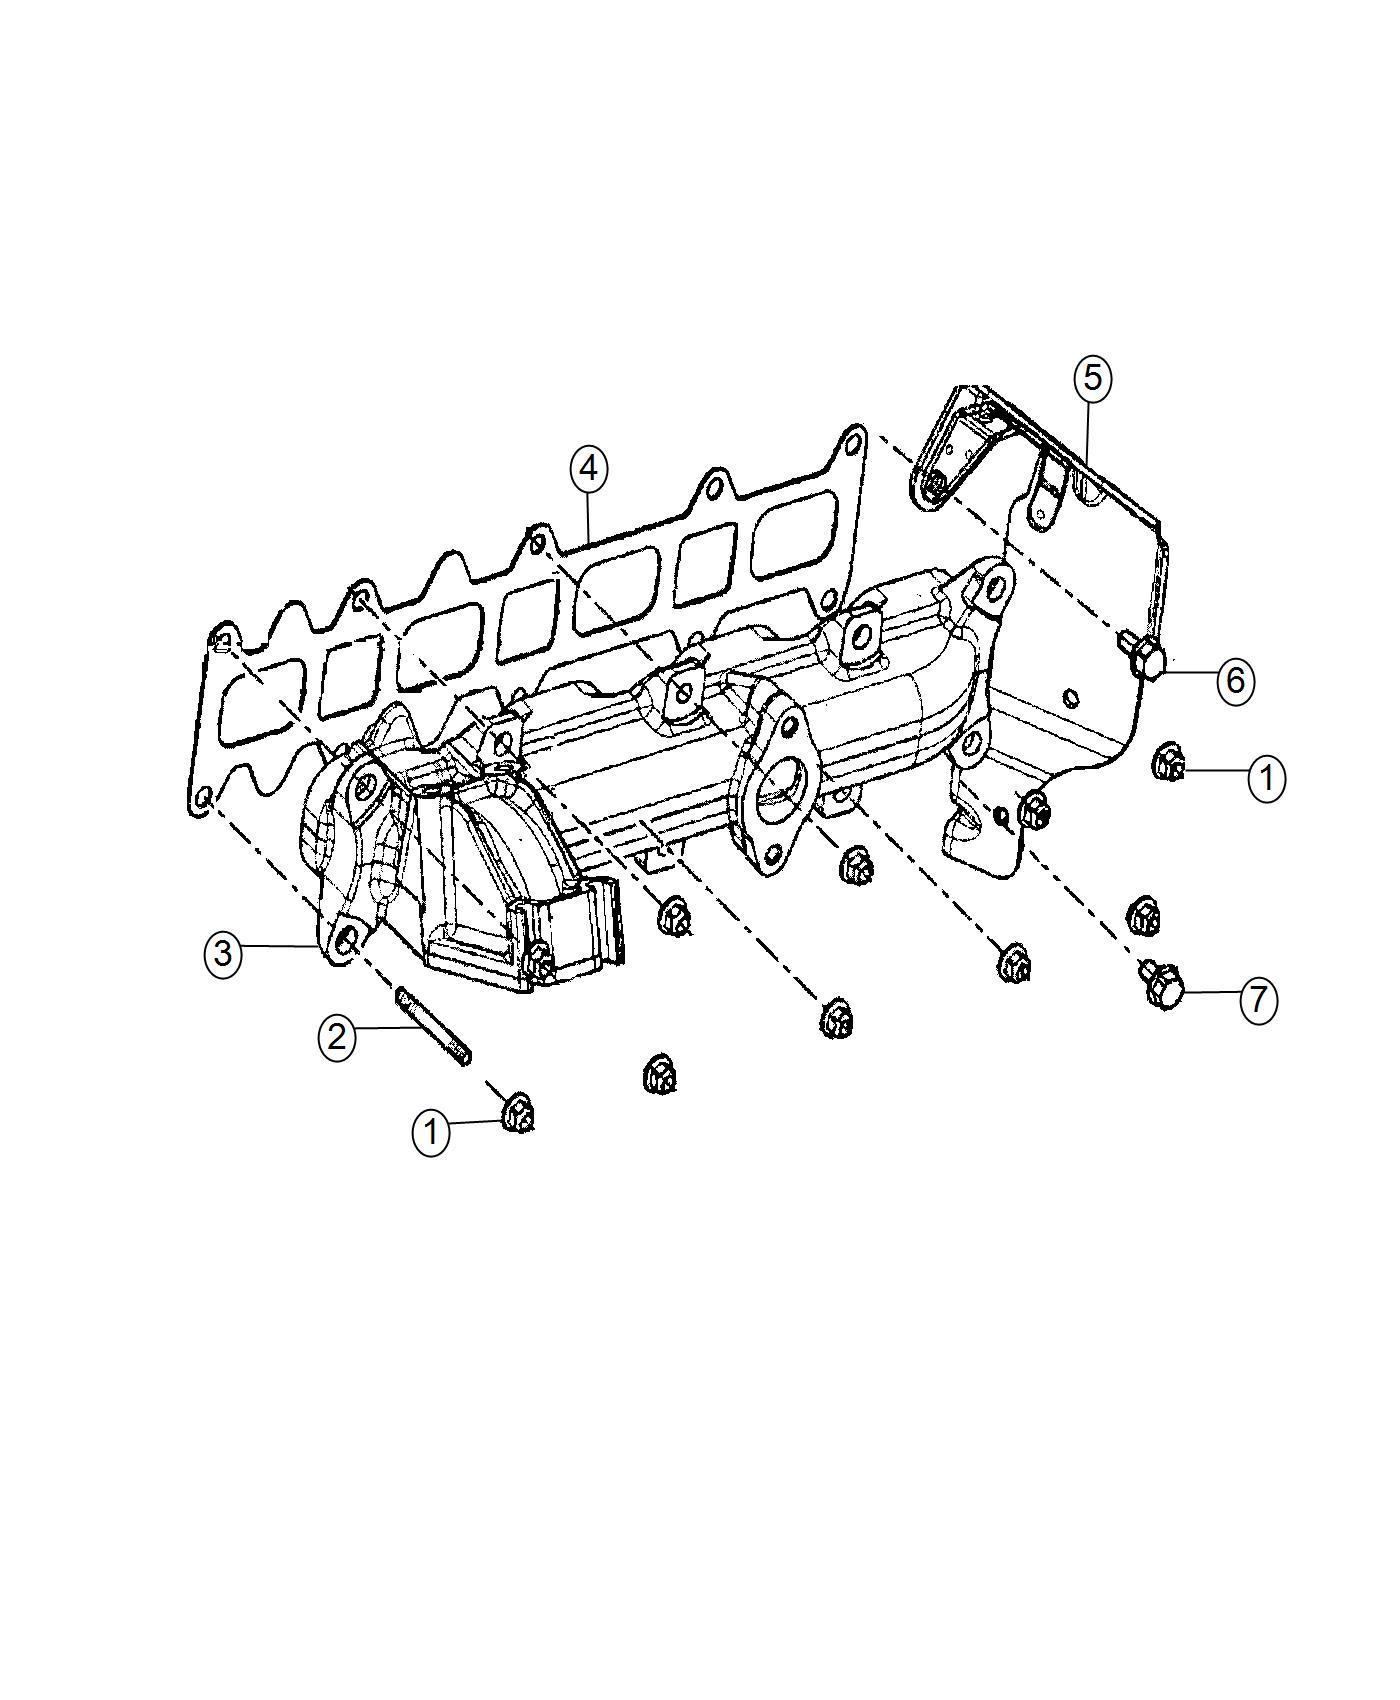 Ram Nut Heater Engine Block